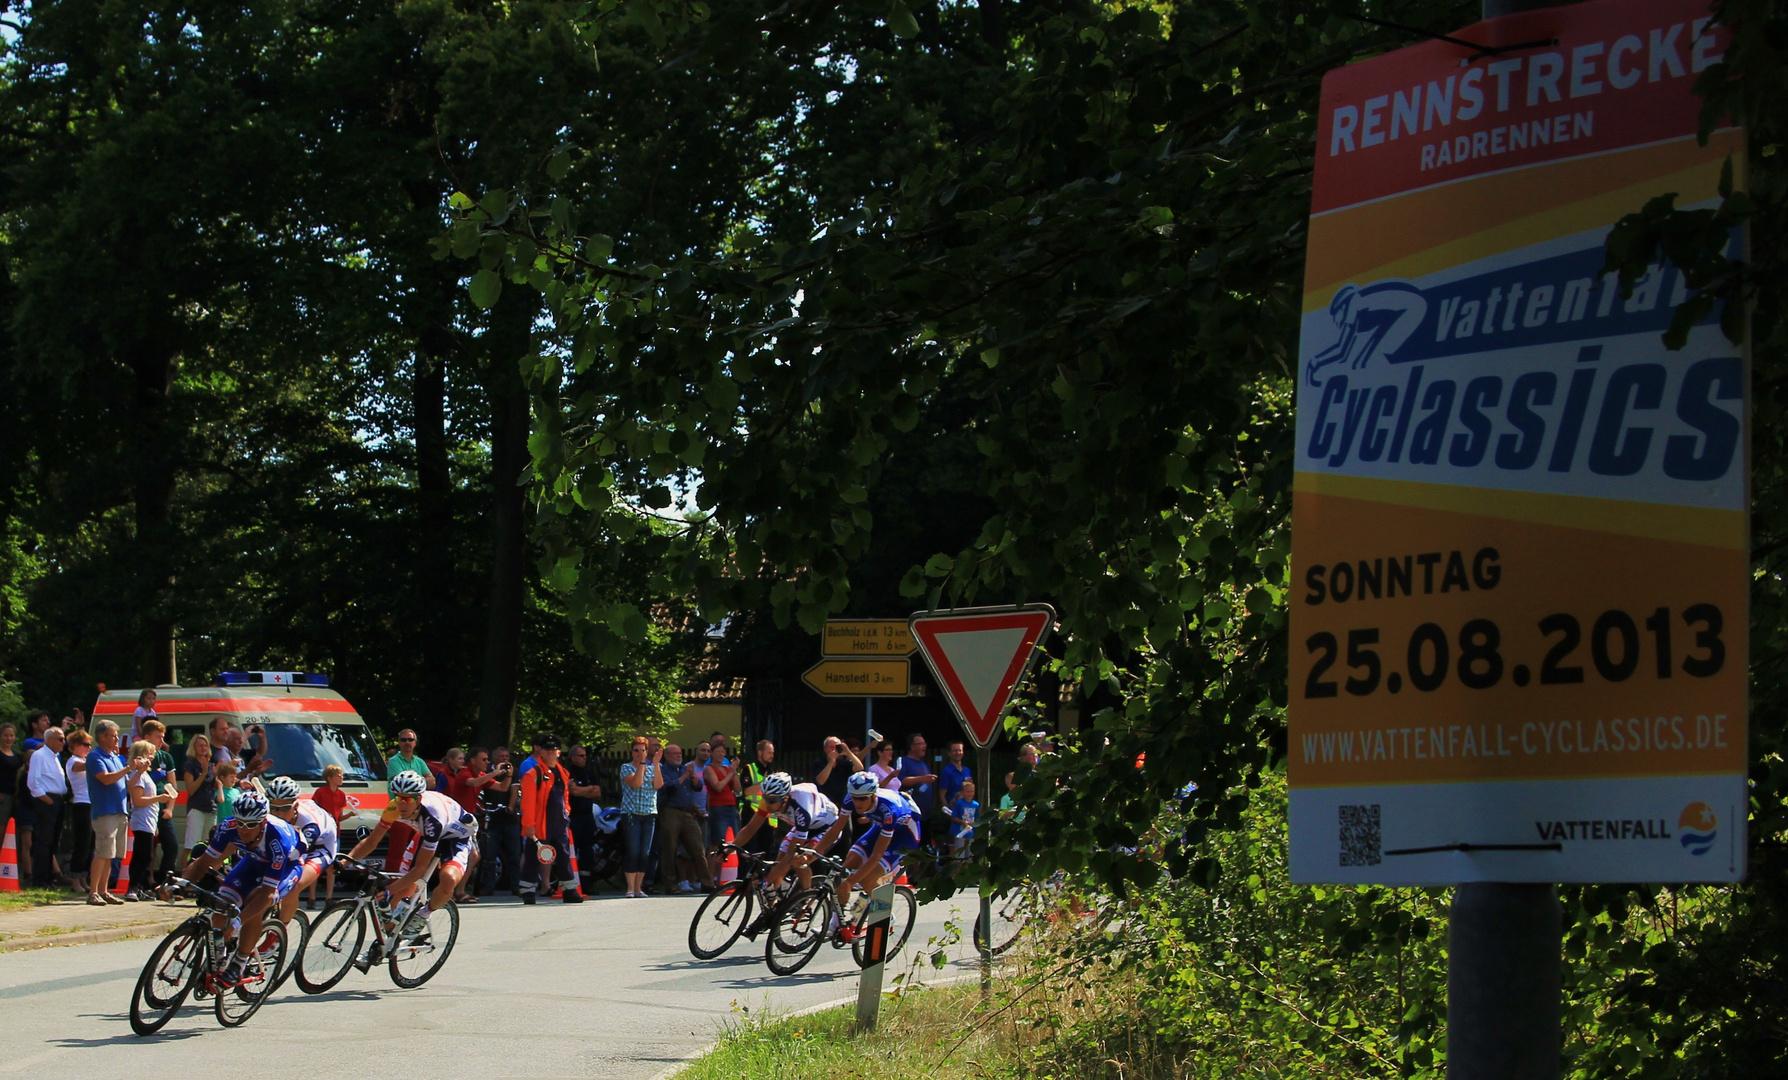 Hamburg Cyclassics 2013